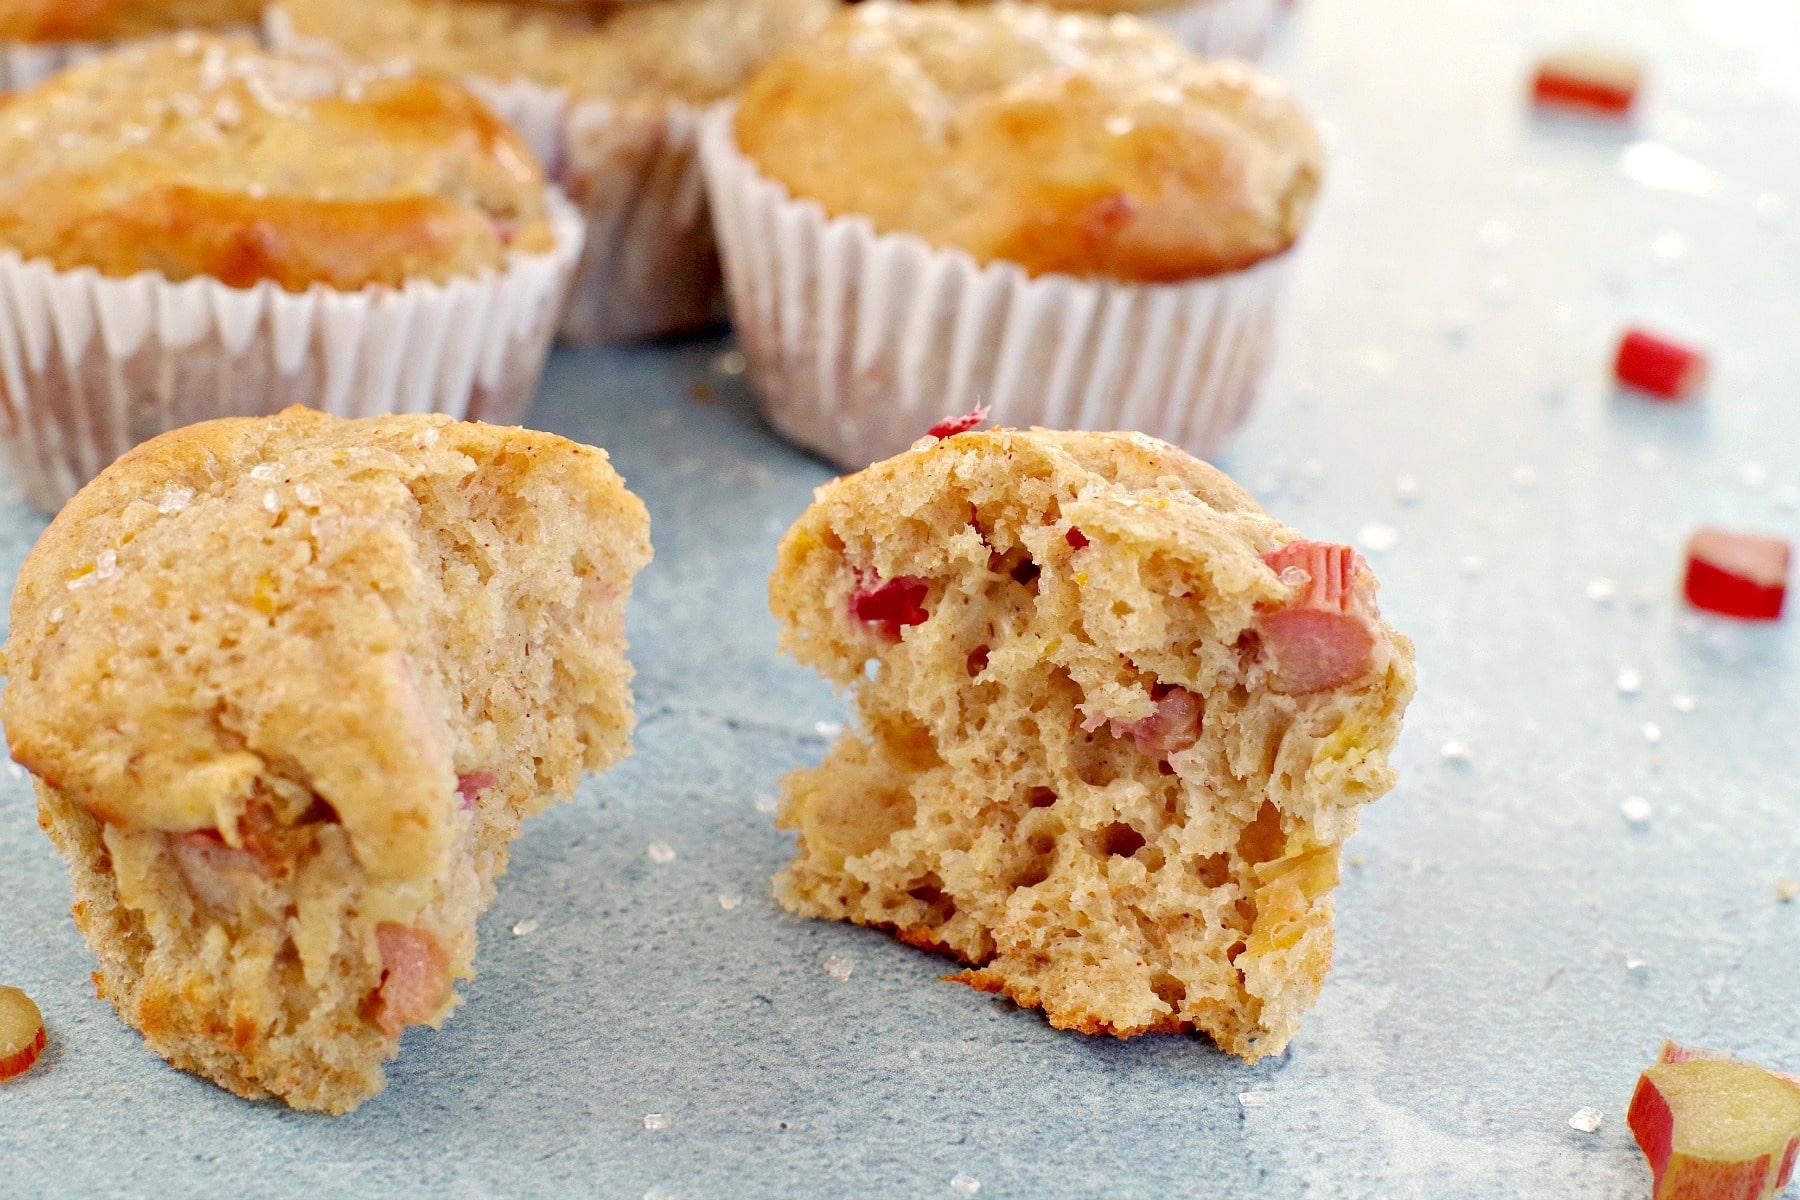 rhubarb muffin split open